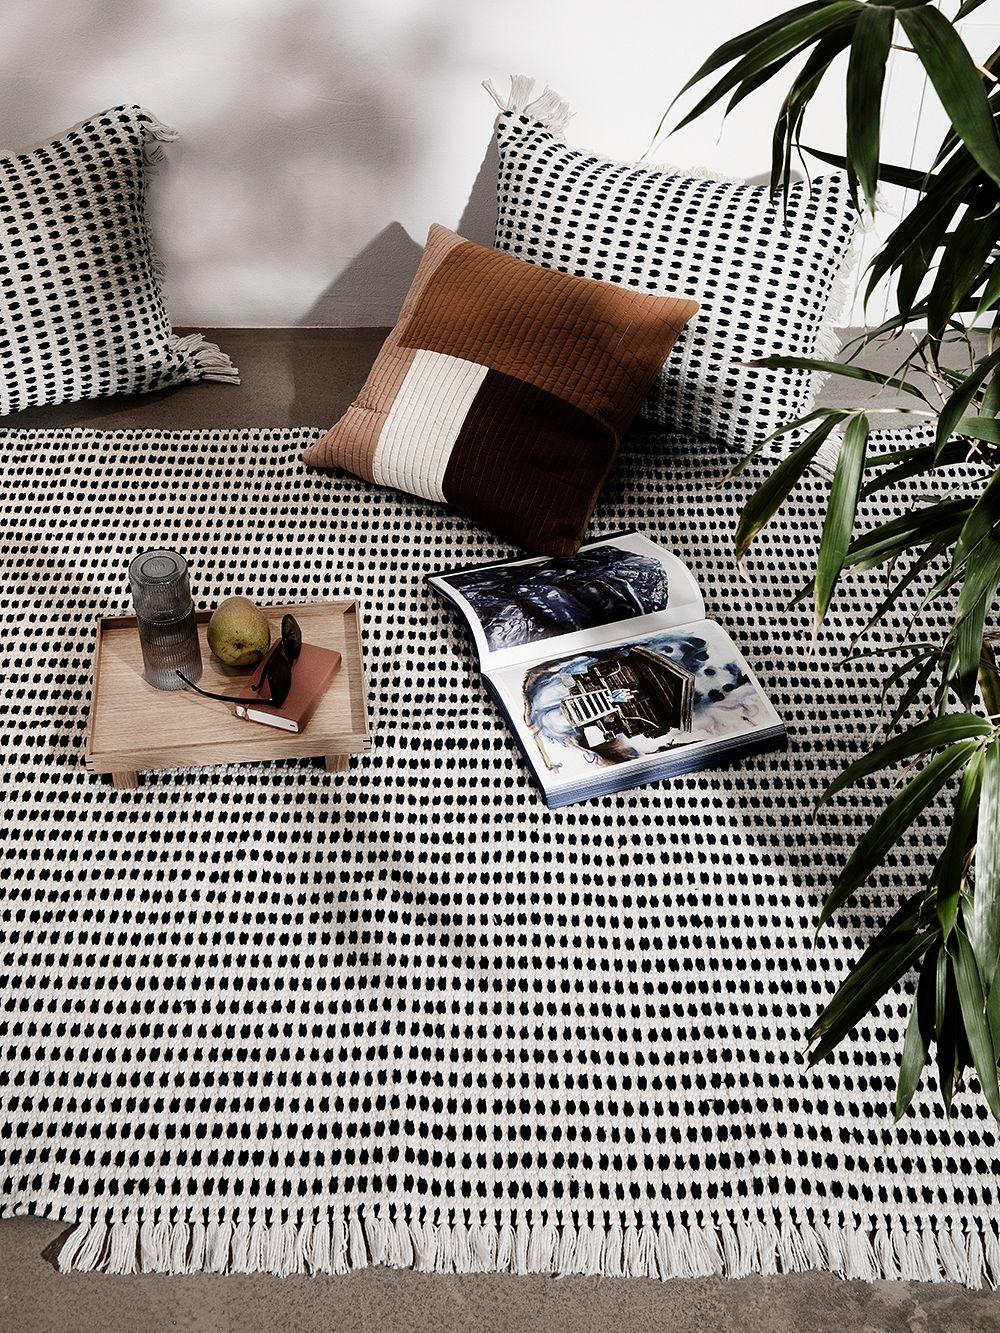 Ferm Living Way rug, 140 x 200 cm, off white - dark blue